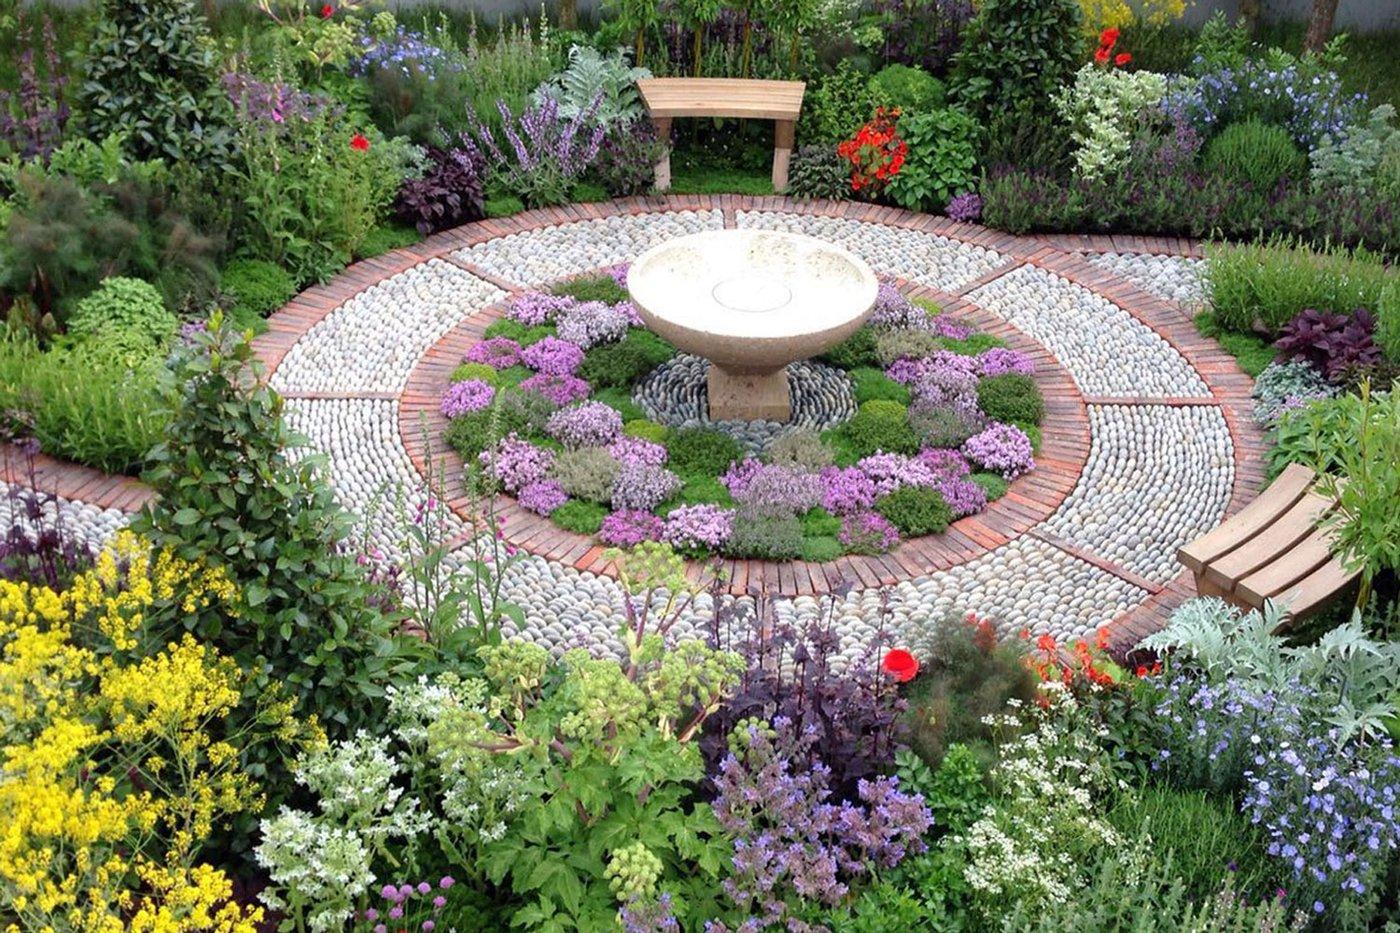 garden-planning 100+ Surprising Garden Design Ideas You Should Not Miss in 2021